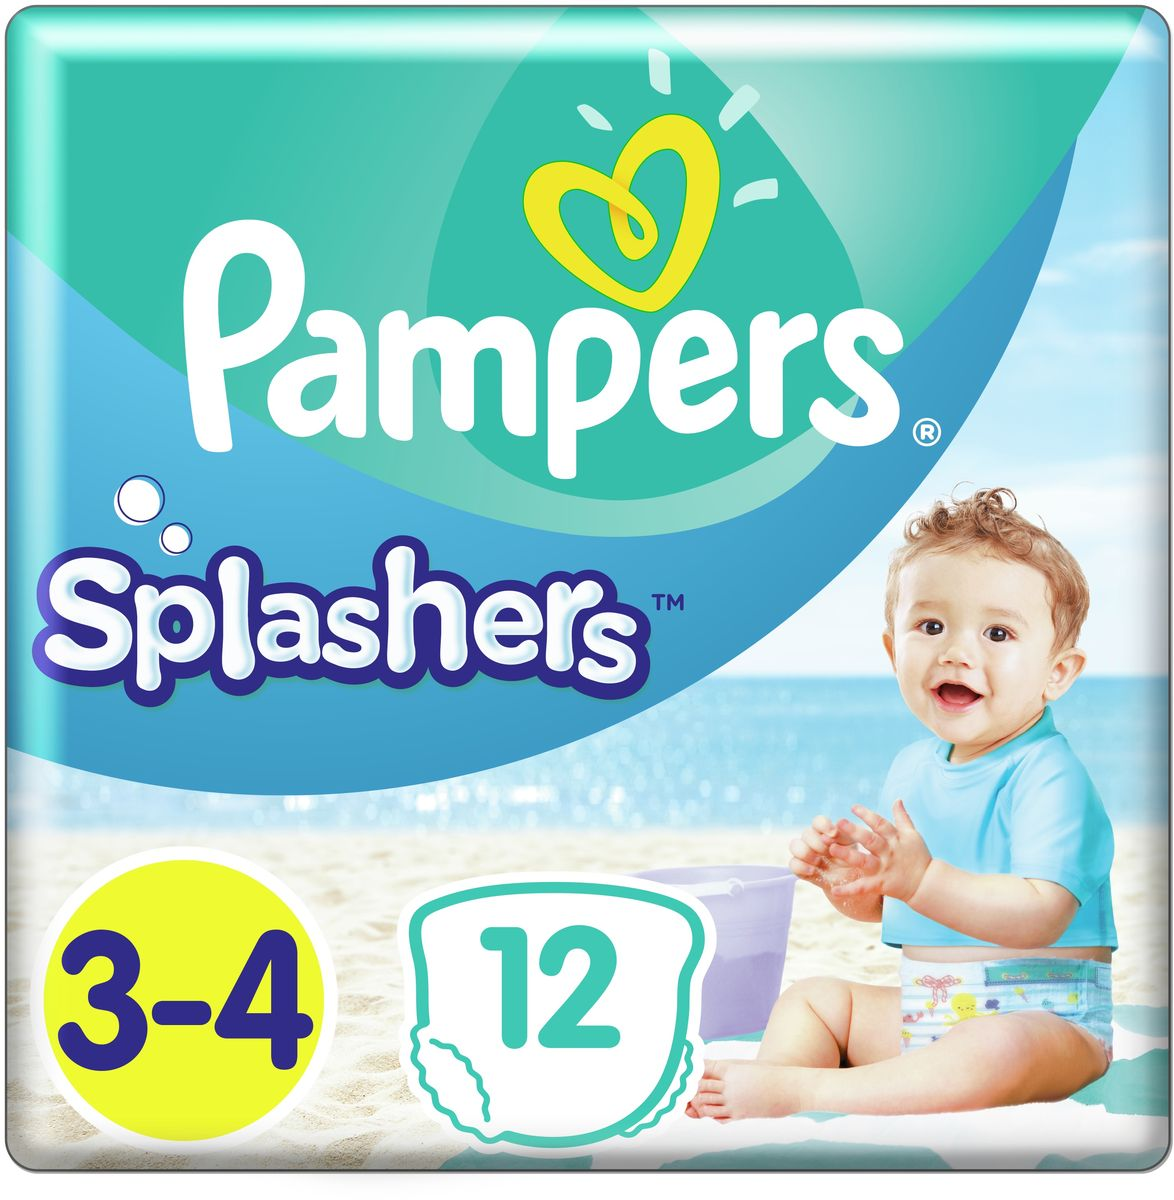 Pampers Трусики для плавания Splashers 6-11 кг размер 3-4 12 шт трусики подгузники pampers splashers для плавания maxi junior 9 15 кг 11 шт